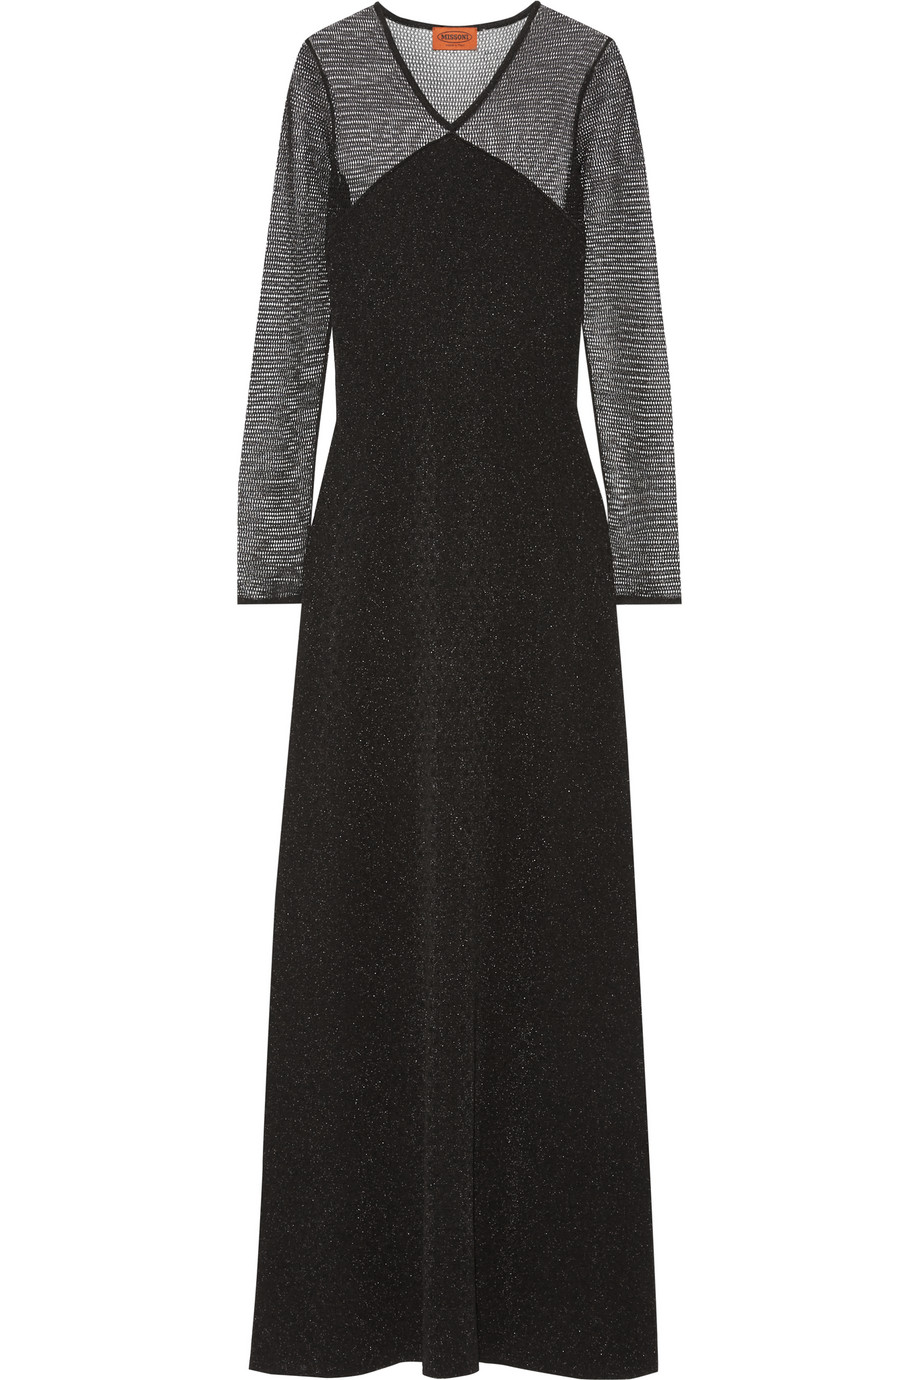 Missoni Metallic Crochet-Knit Gown, Black, Women's - Metallic, Size: 42